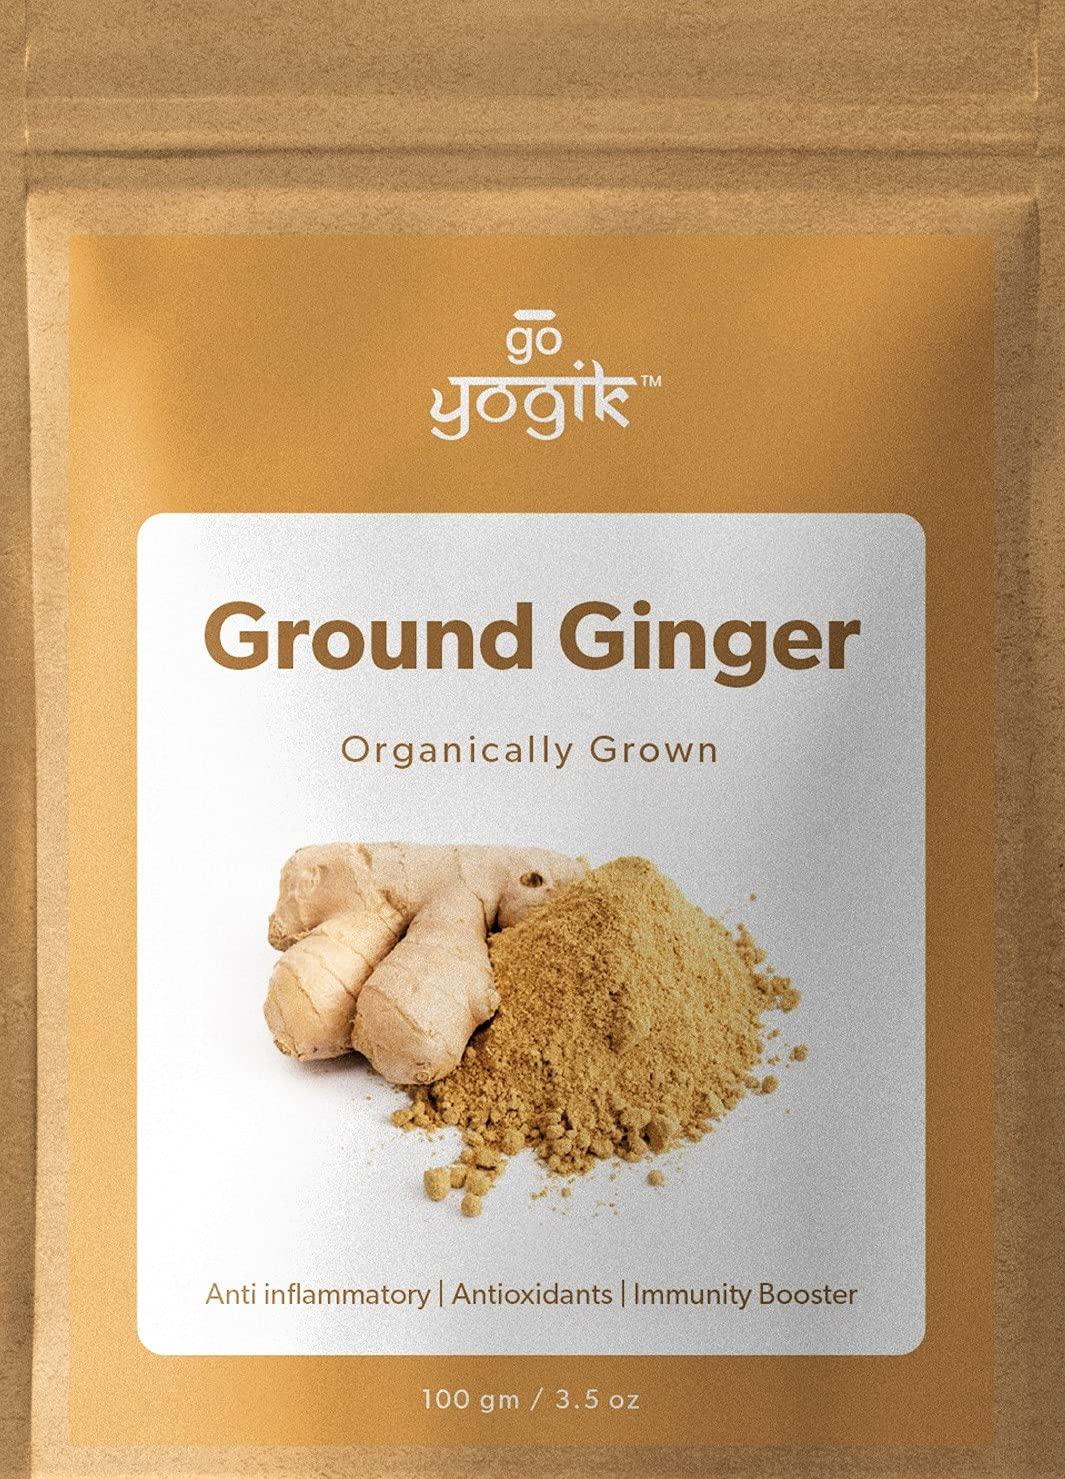 Go-Yogik Dry Ginger powder Ranking TOP19 100g Strong 3.5Oz Max 52% OFF flavor -Organic